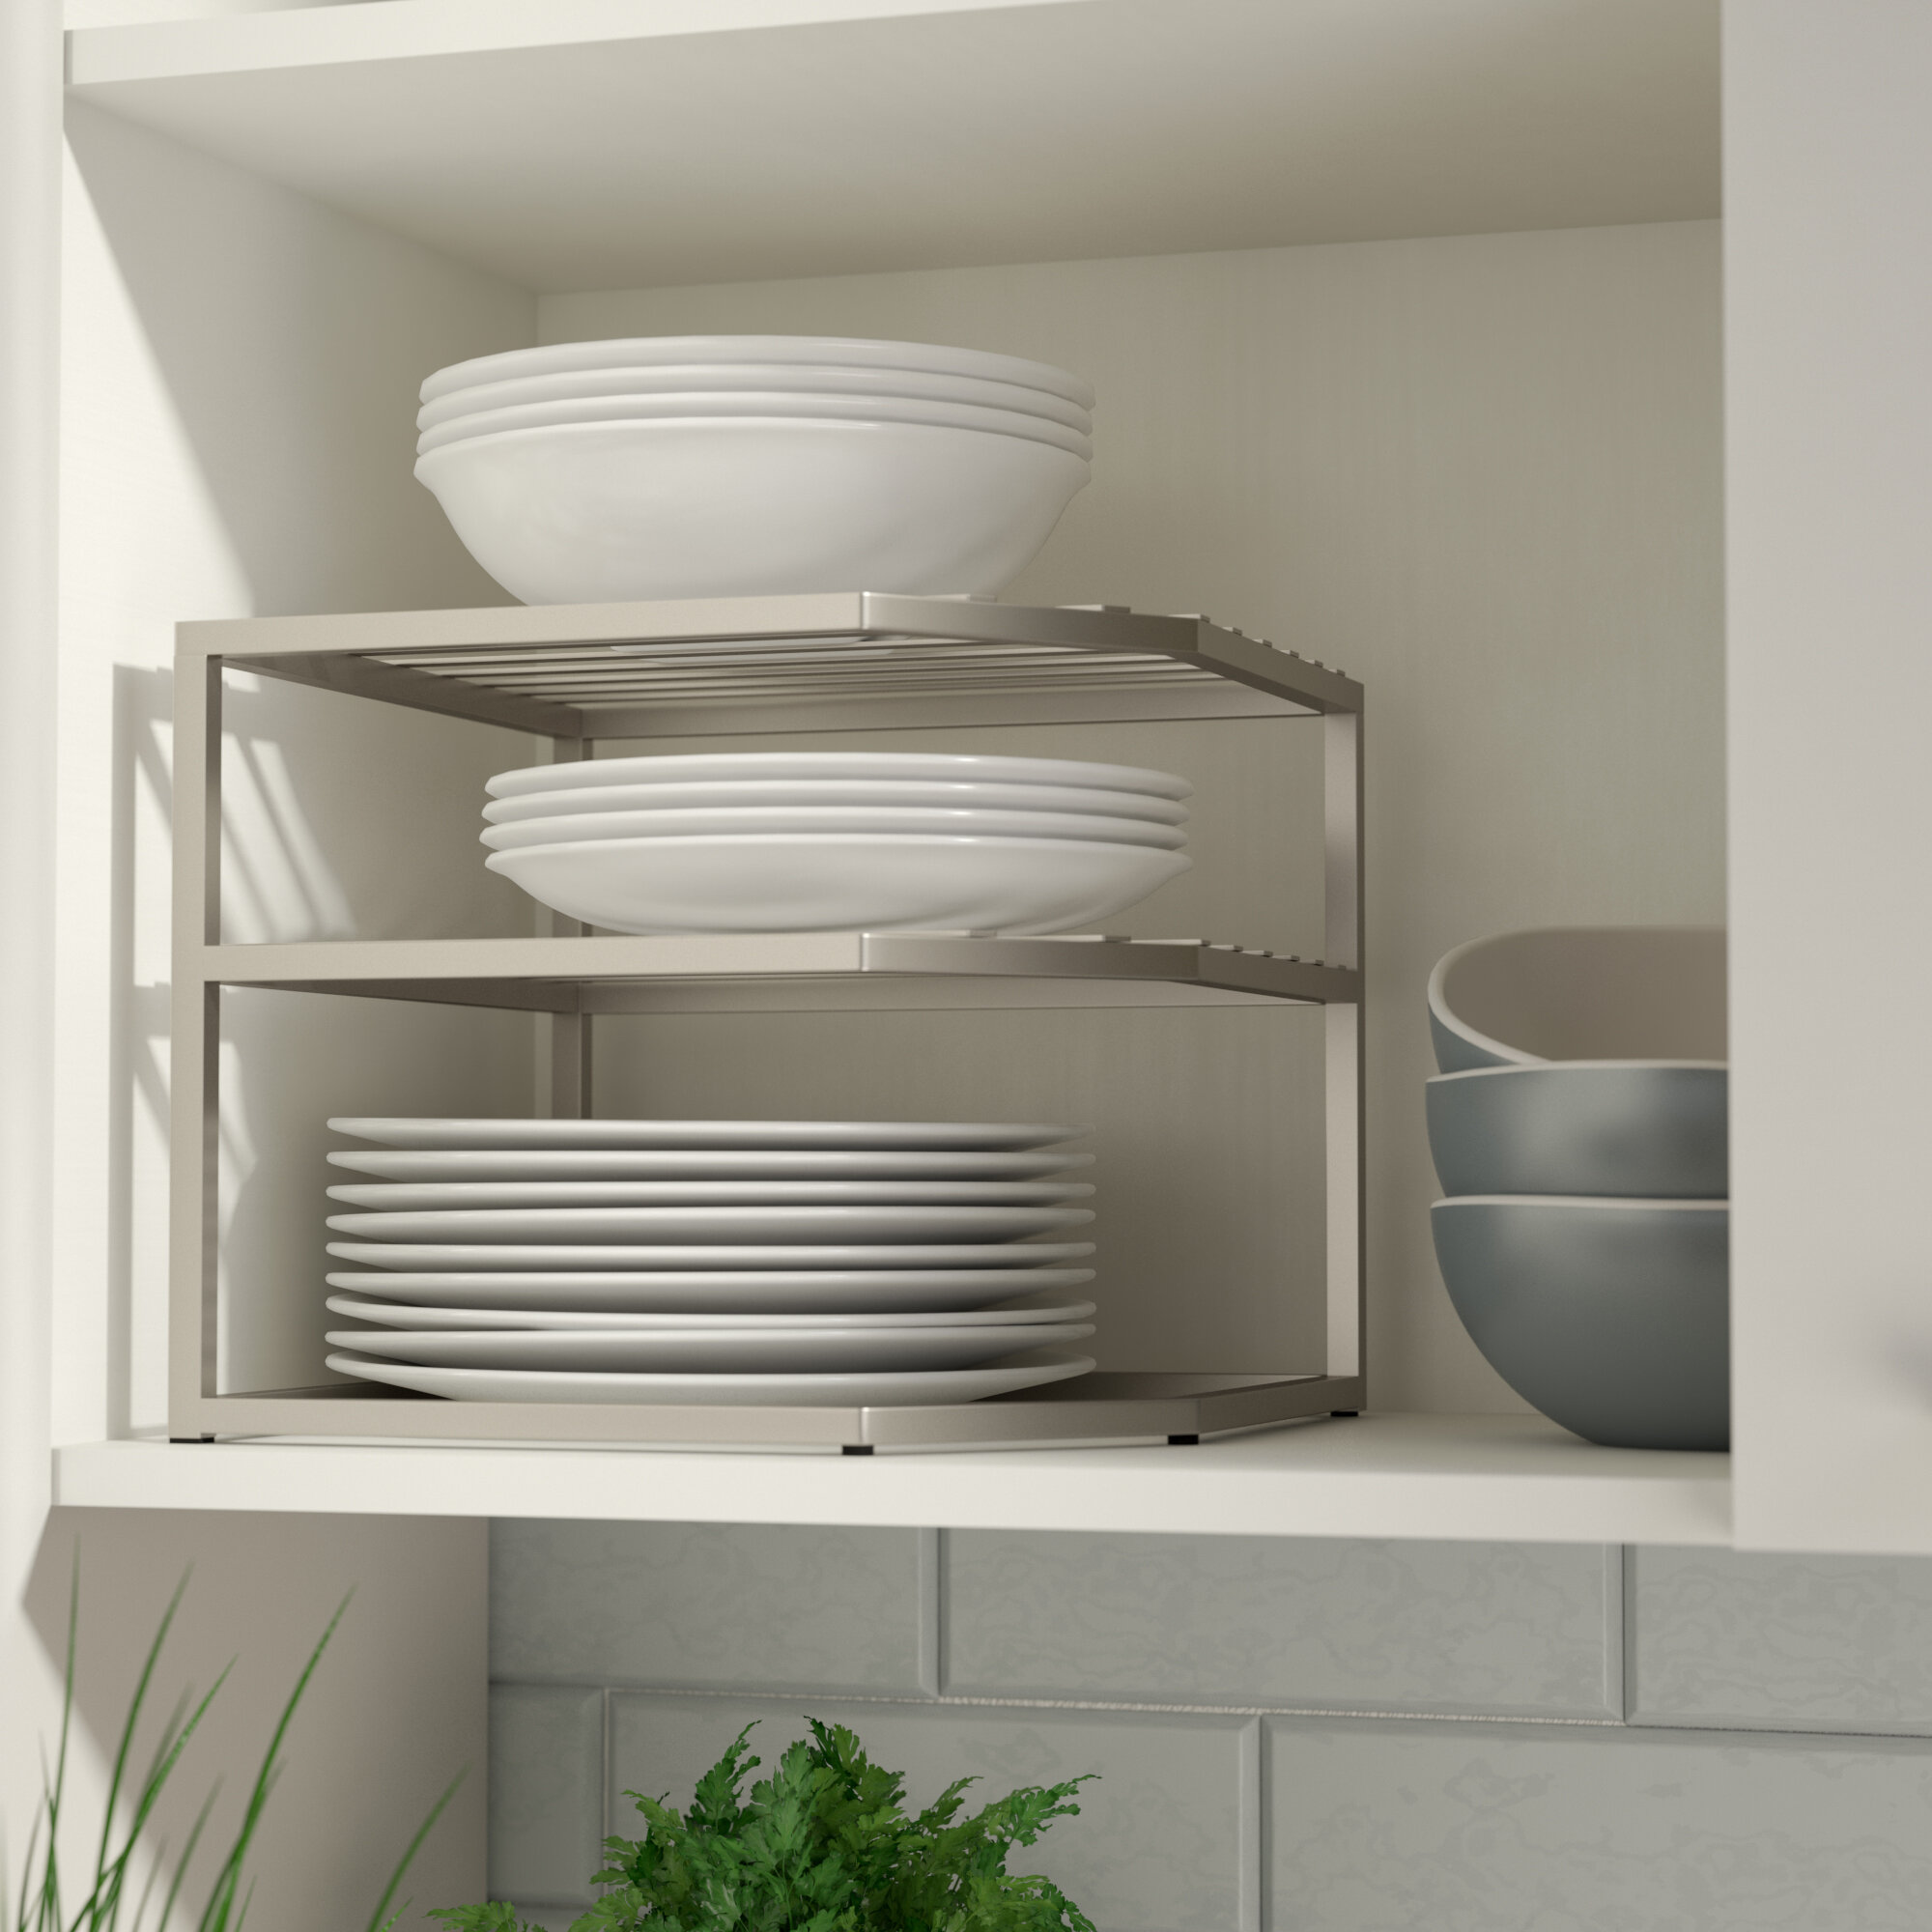 Rebrilliant Prevatte Corner Kitchen Cabinet Organizer Shelving Rack Reviews Wayfair,Black Mold On Walls In Bedroom